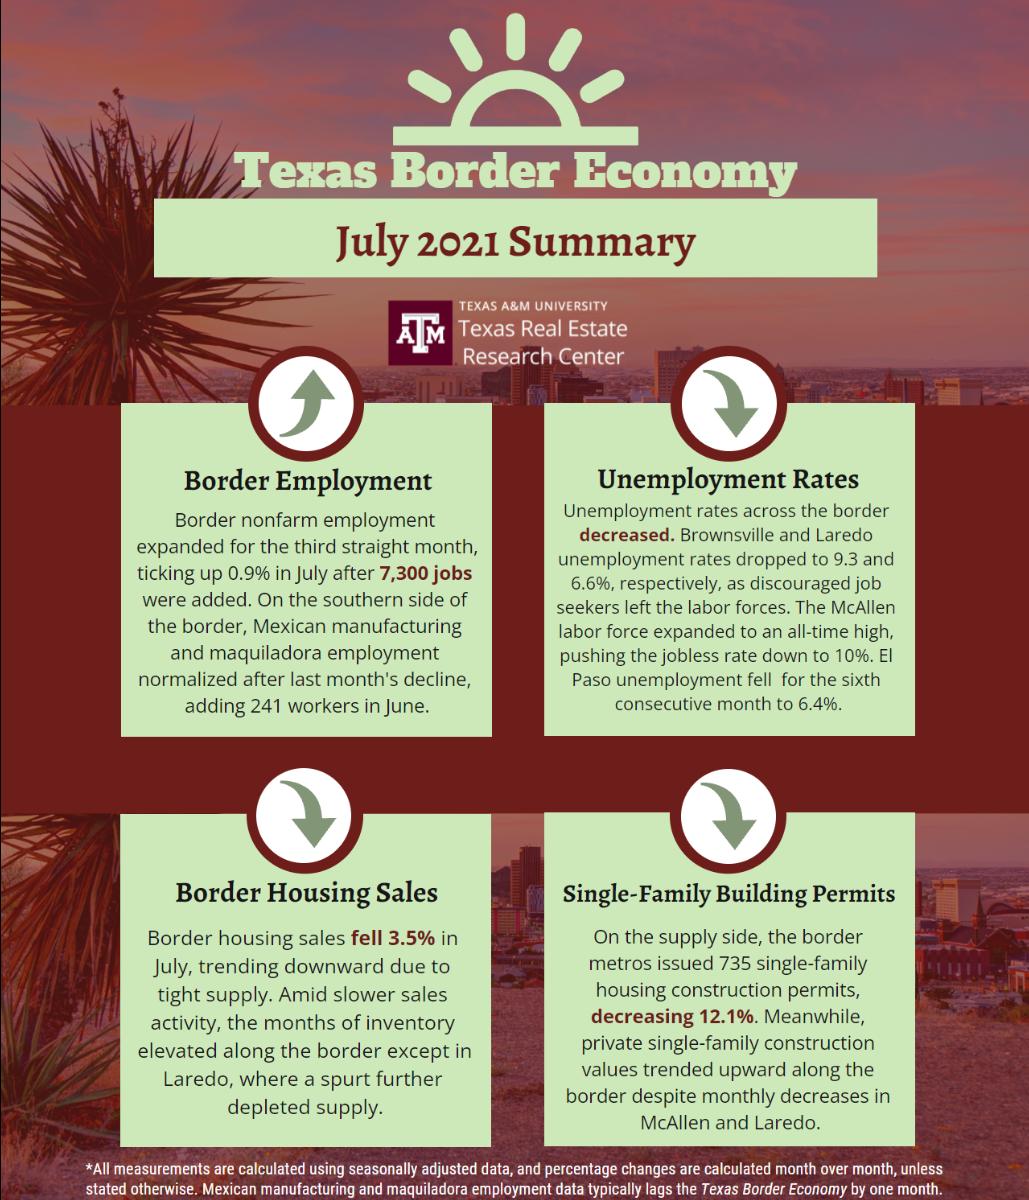 Texas Border Economy - July 2021